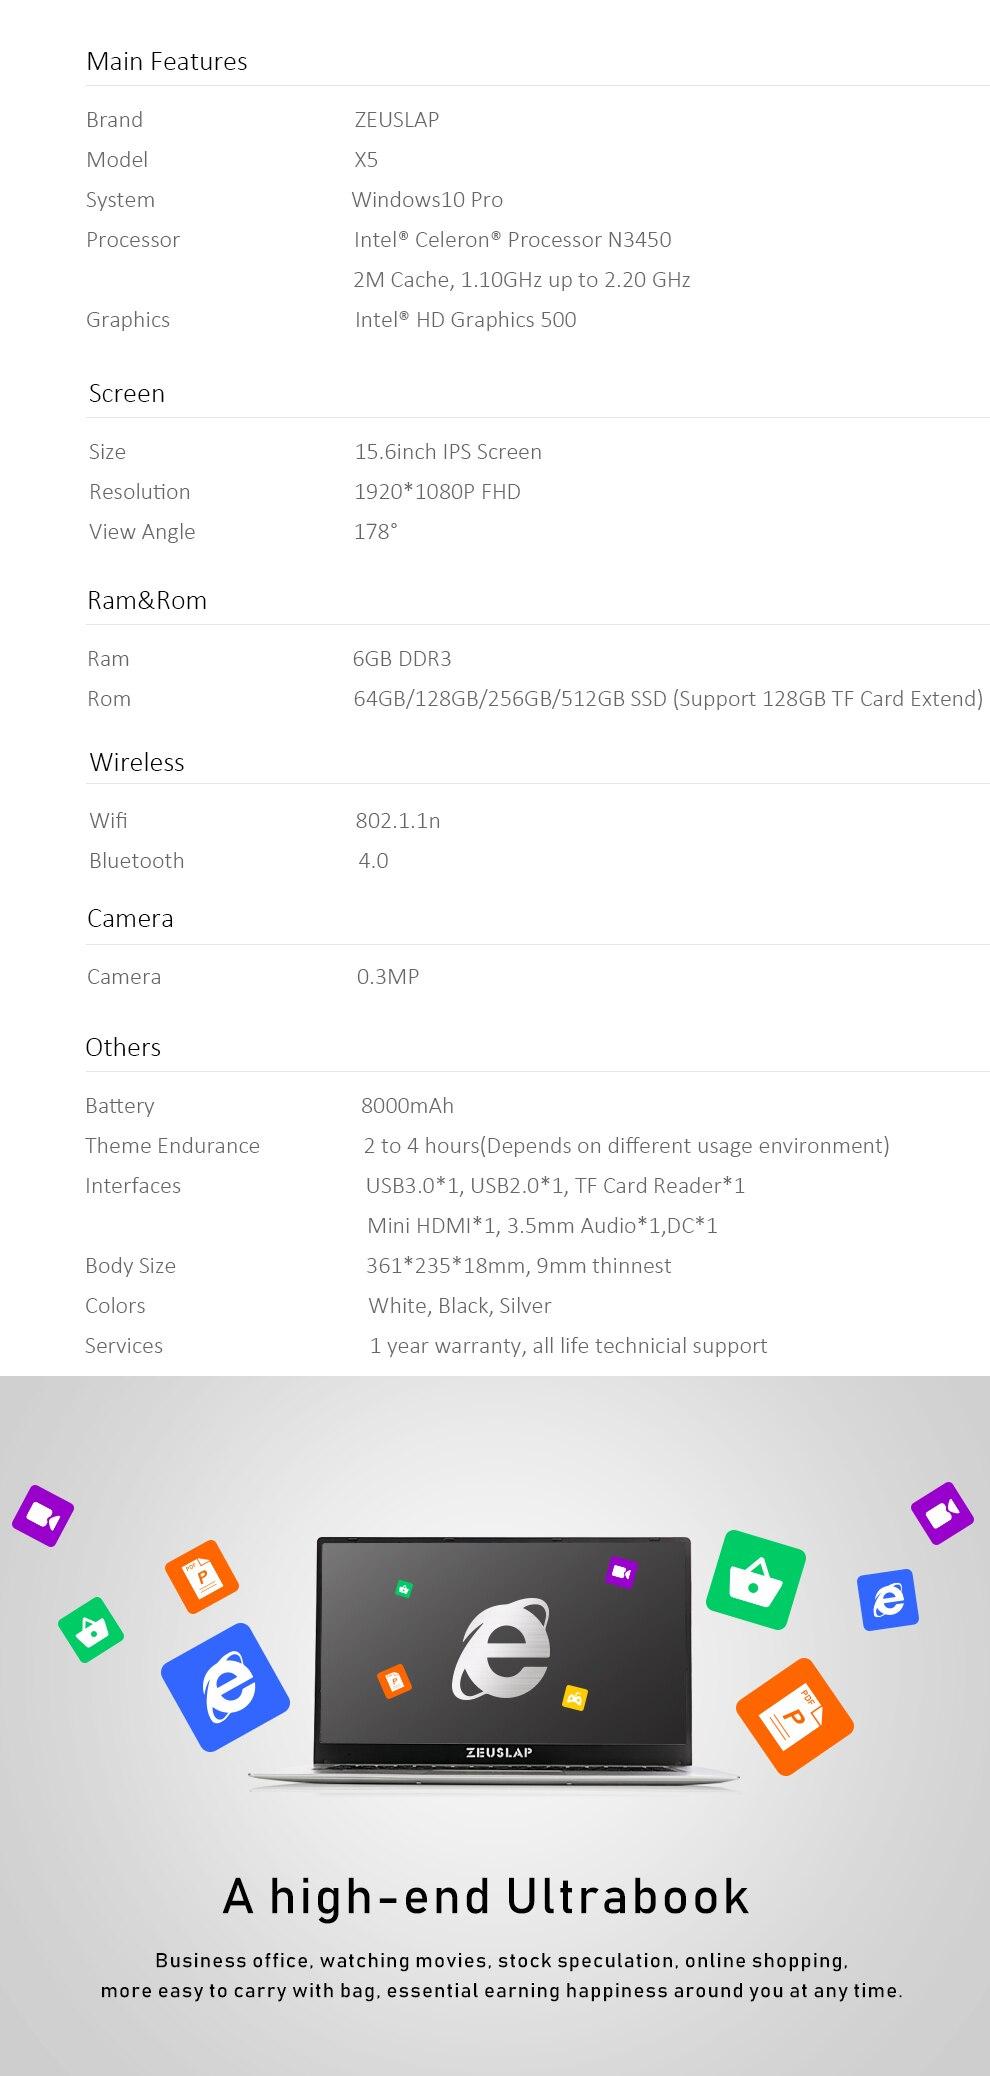 X5-N3450 SSD